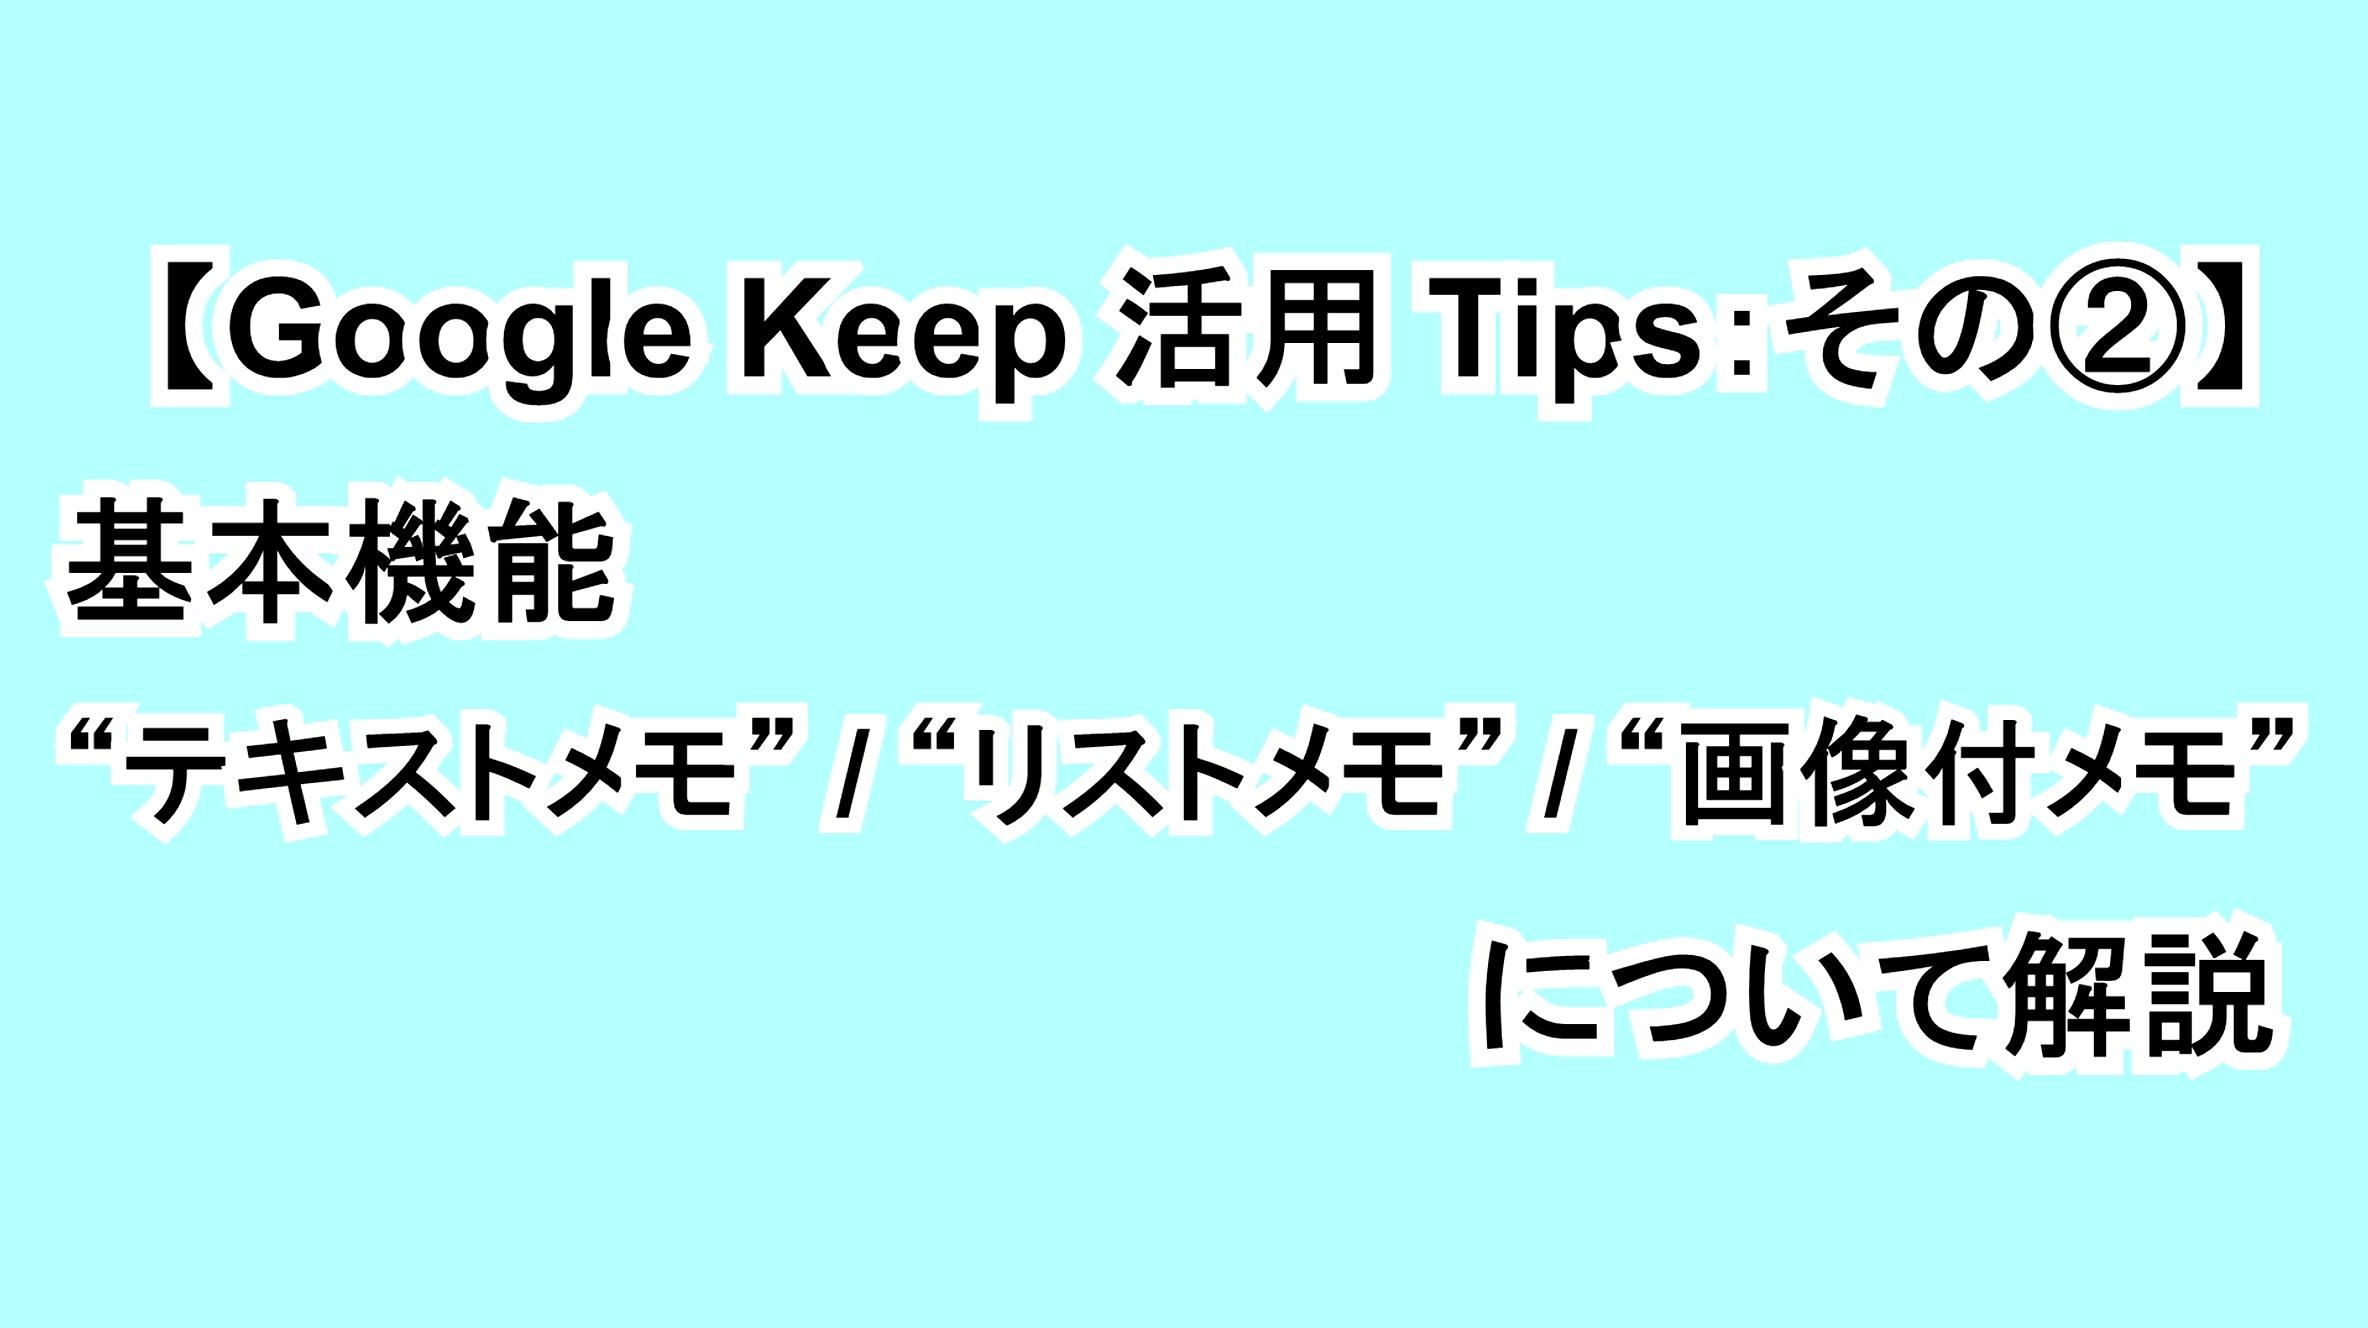 "【Google Keep活用Tips:その②】基本機能""テキストメモ""""リストメモ""""画像付メモ""について解説"